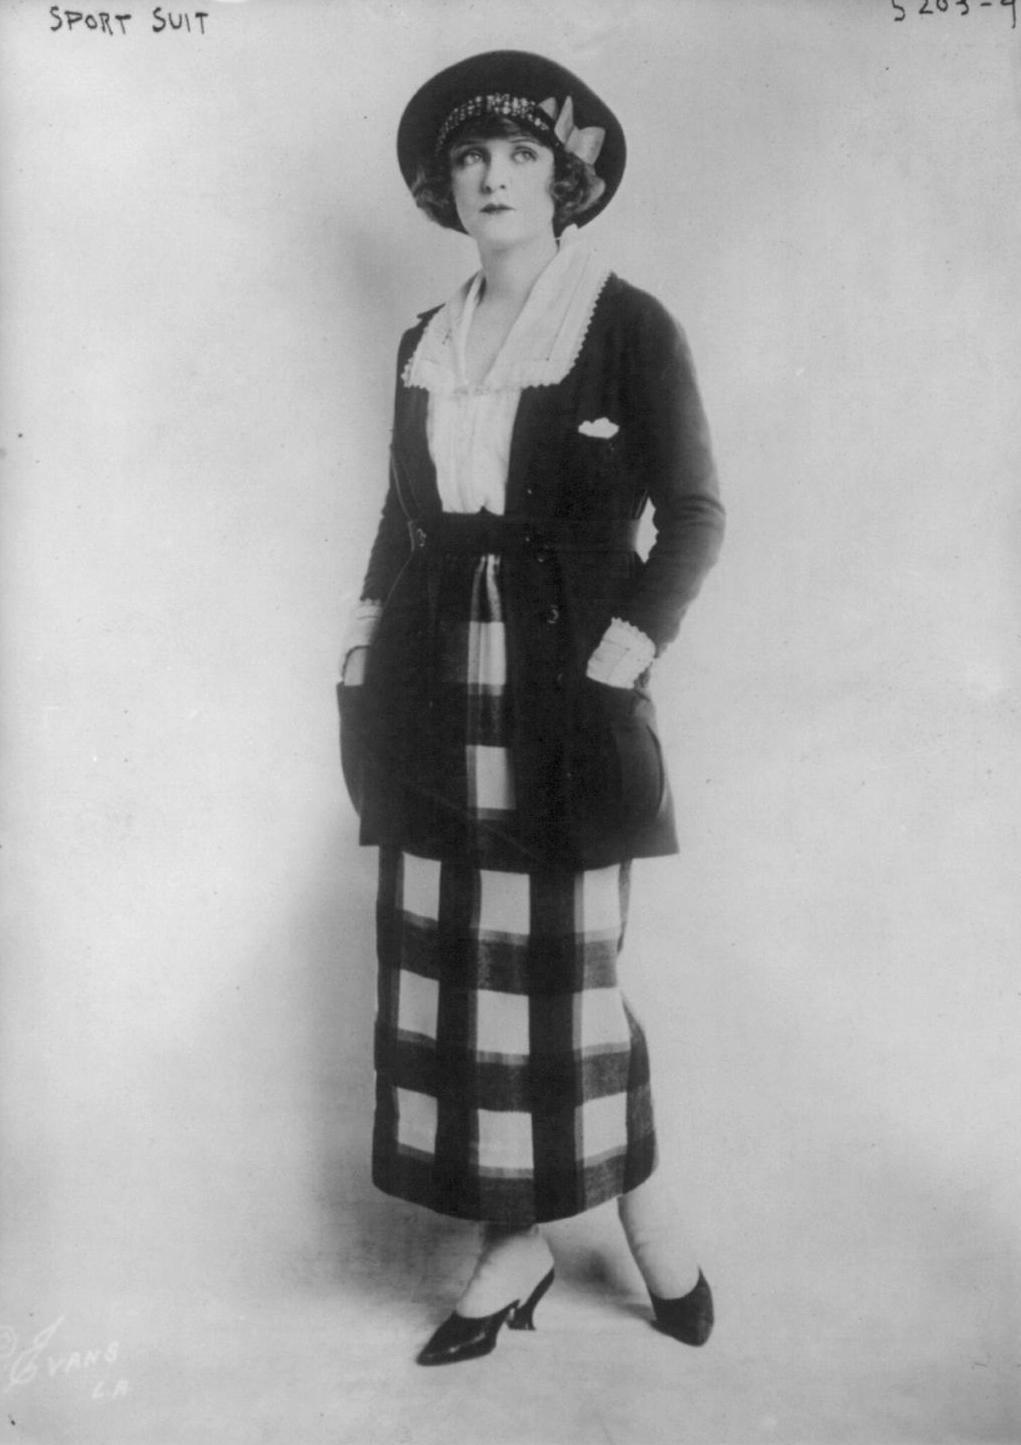 Istorija odevnih predmeta - Page 7 1920sportsuit